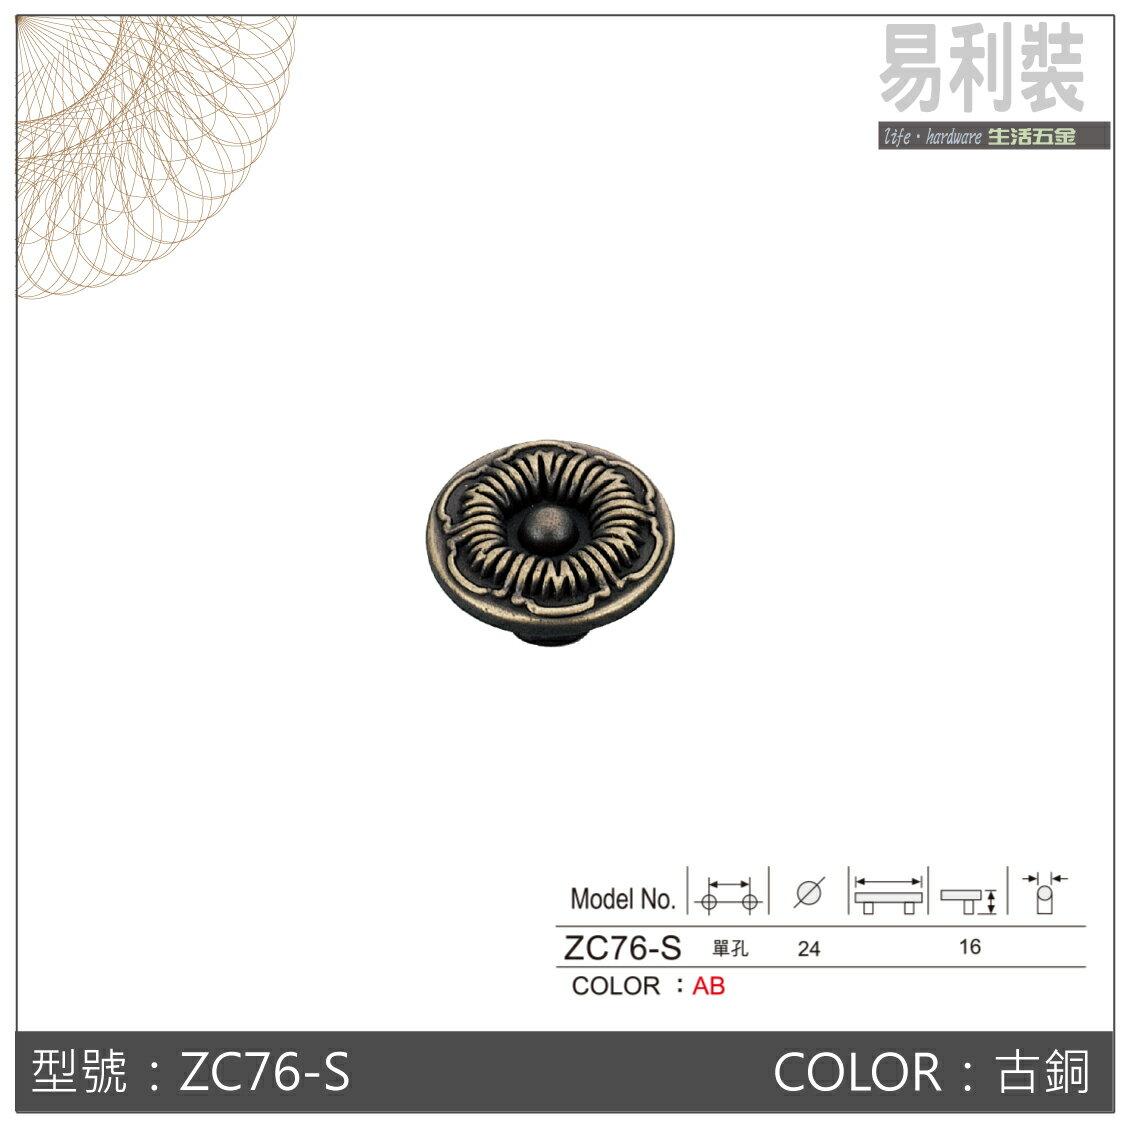 ZC76-S-古銅色 易利裝生活五金 櫥櫃抽屜把手取手 古典把手 復古把手 鋅合金把手